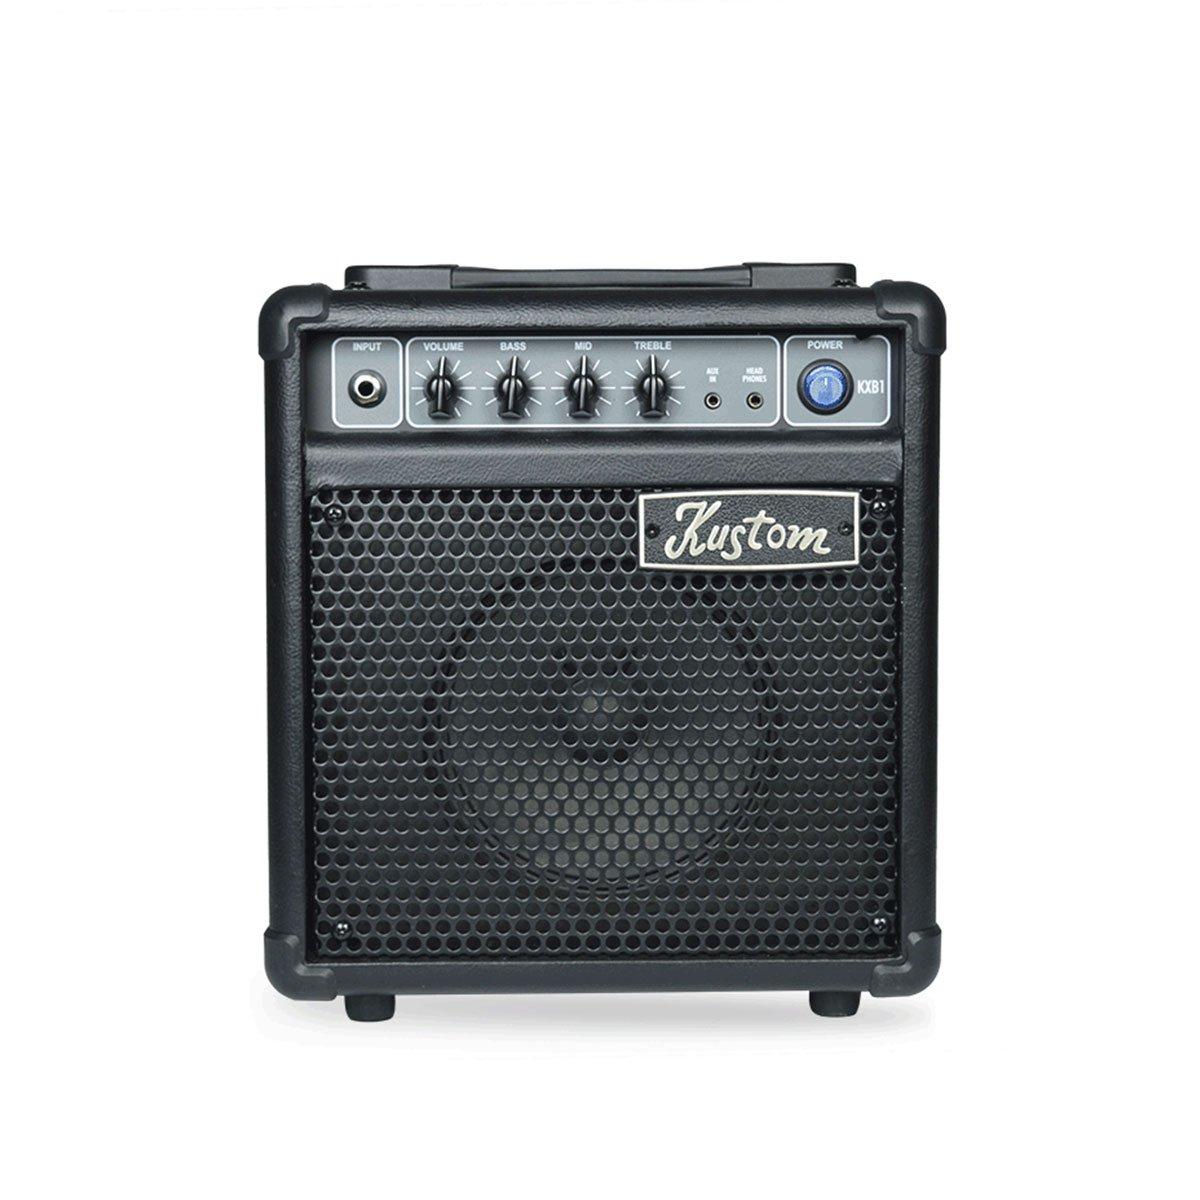 Kustom KXB1 10-Watt 1 x 6 Bass Combo w/ 3-band EQ Aux In and Headphone Out